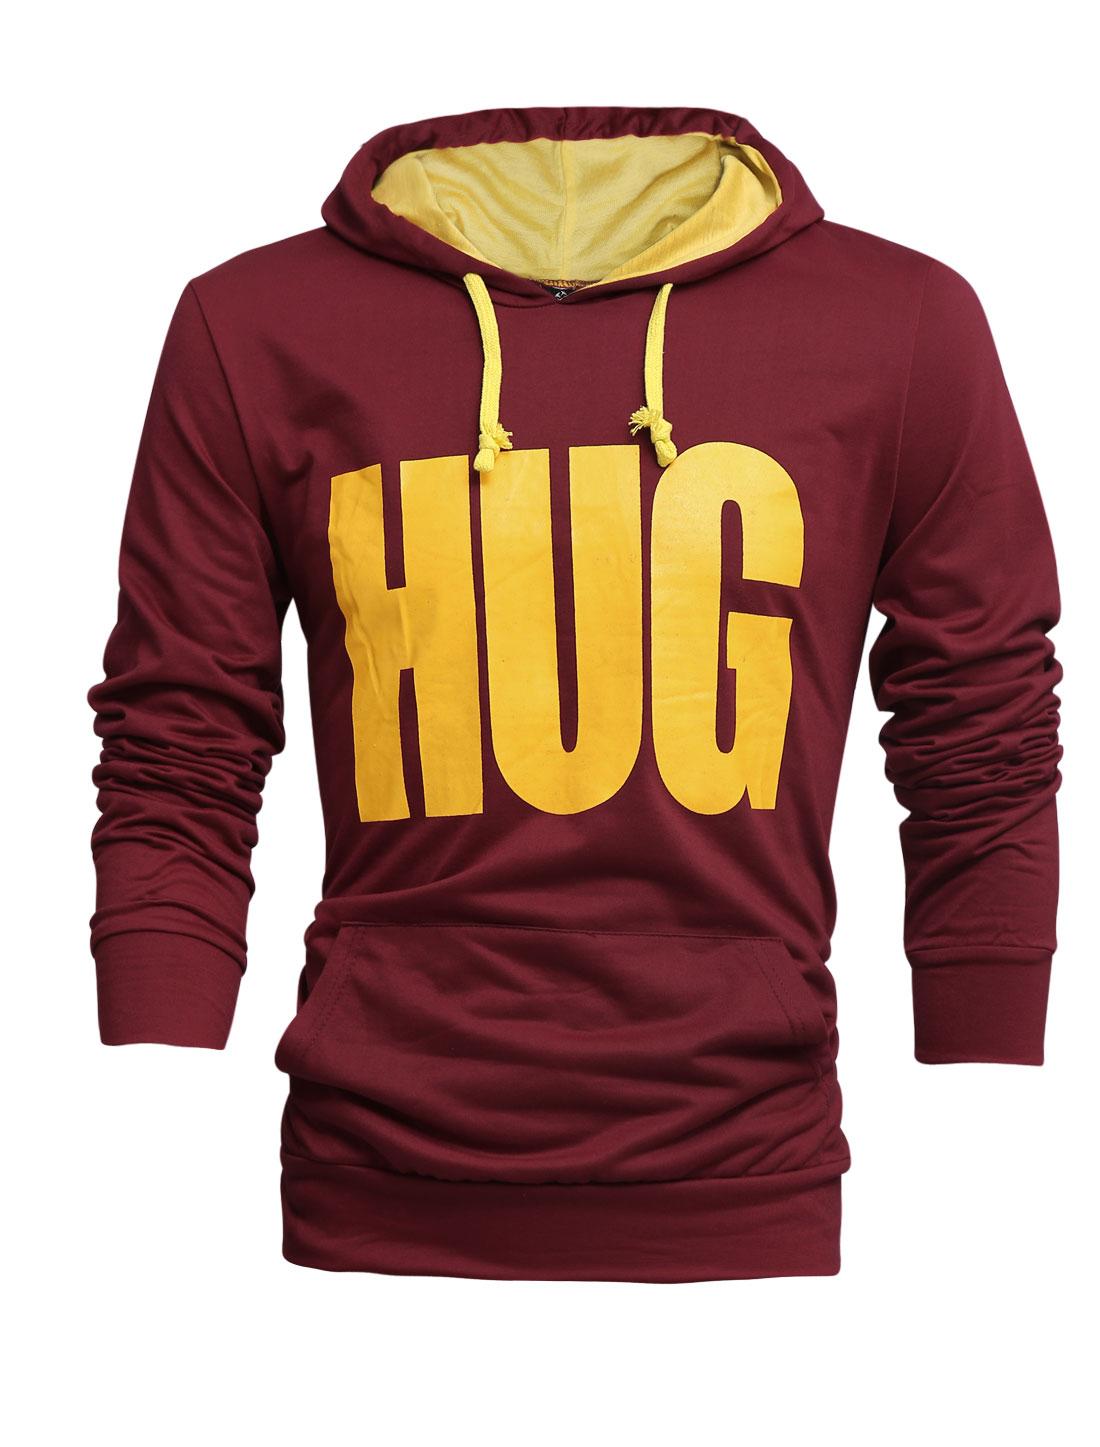 Men Drawstring Hooded Letters Prints Leisure Top Shirt Burgundy M